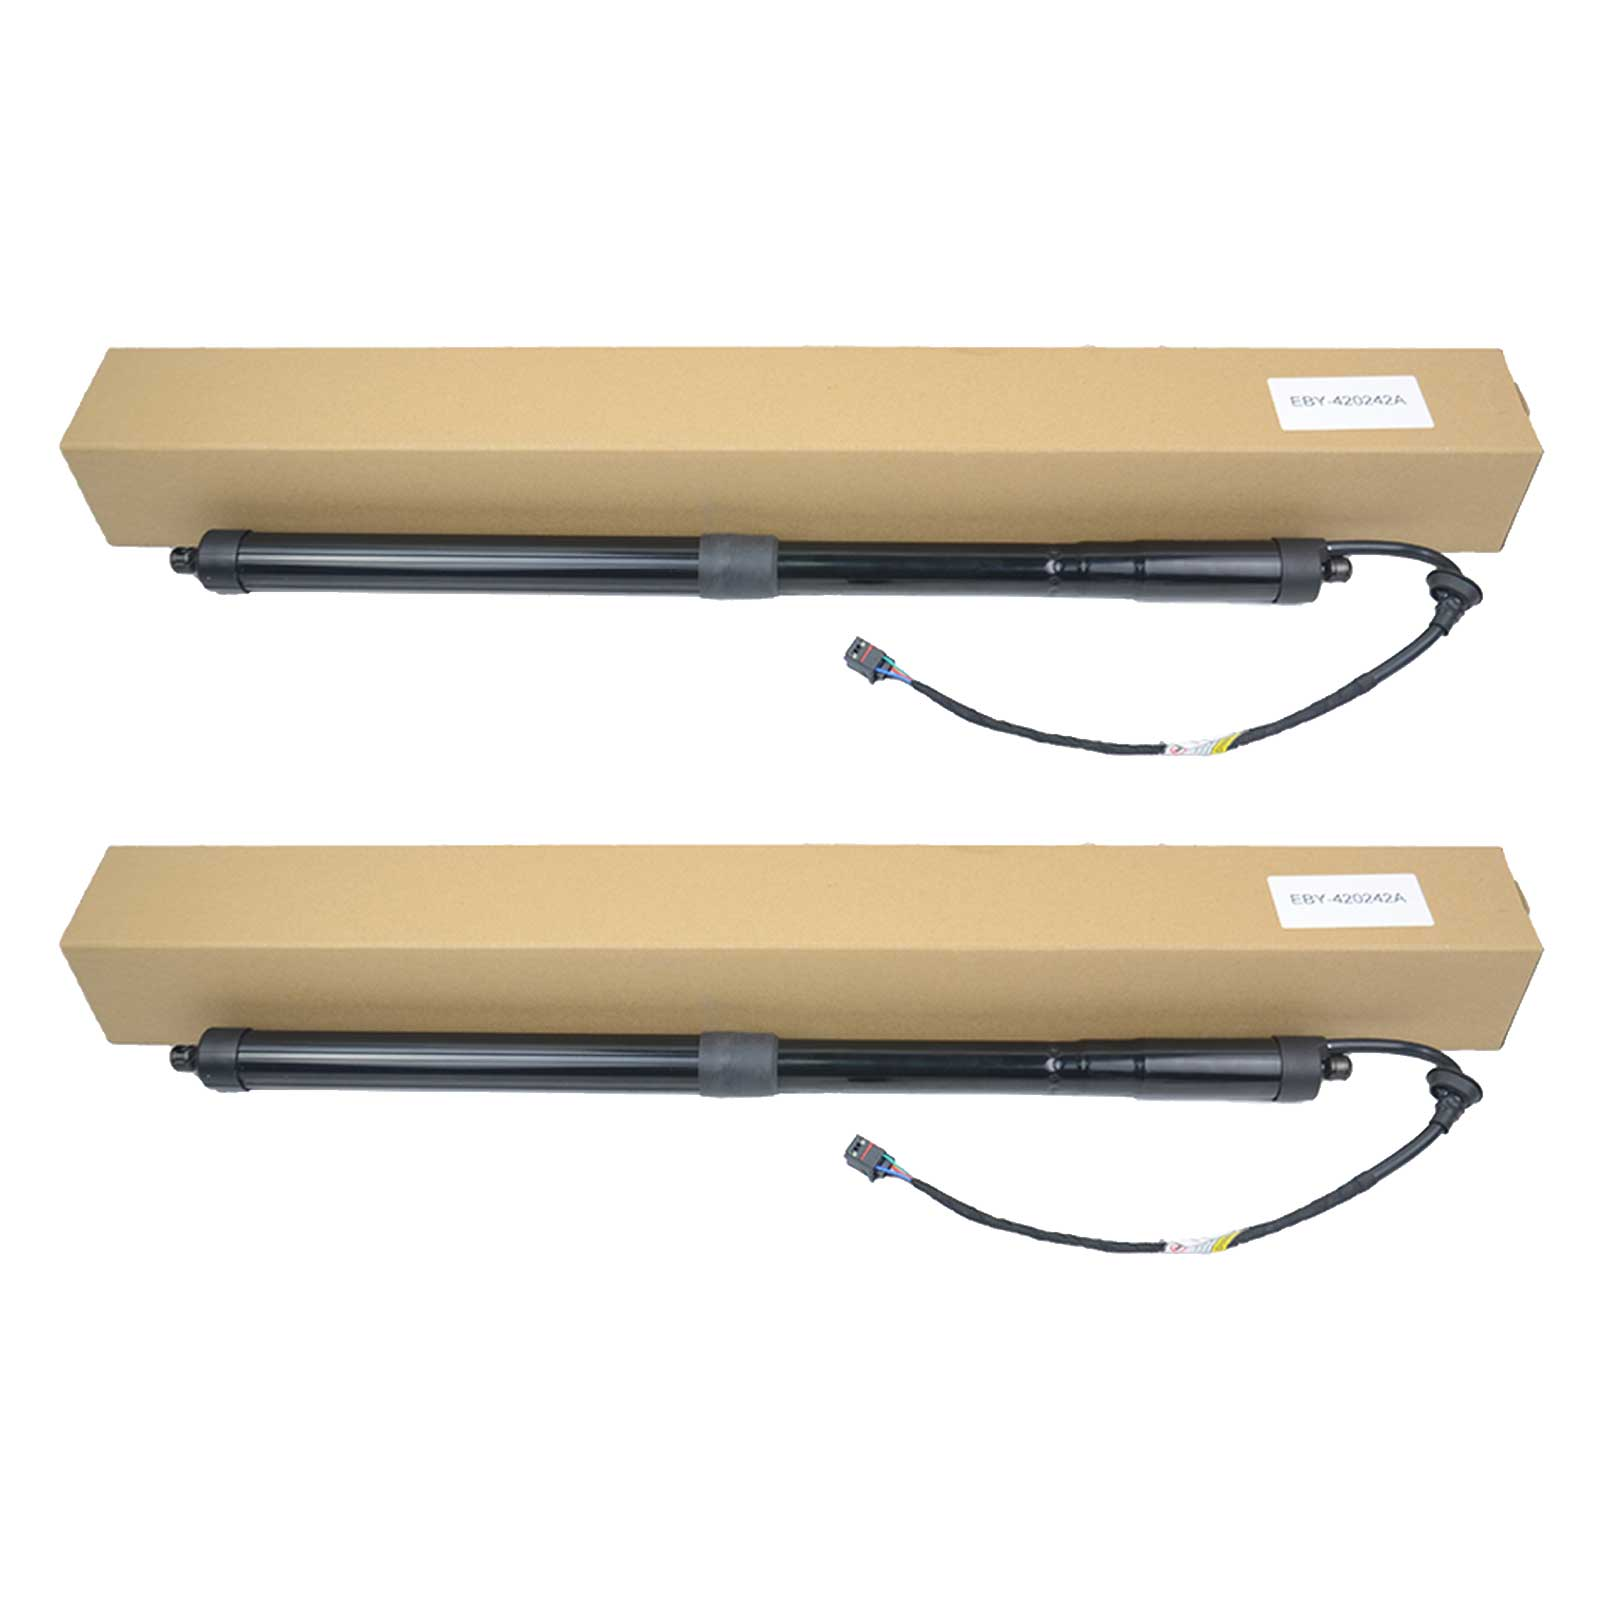 AP01 2 قطعة 7P5 الخلفية الكهربائية الباب الخلفي رفع غازي تبختر لشركة فولكس فاجن طوارق 2010-2015 7P6827851D 7P6827851F